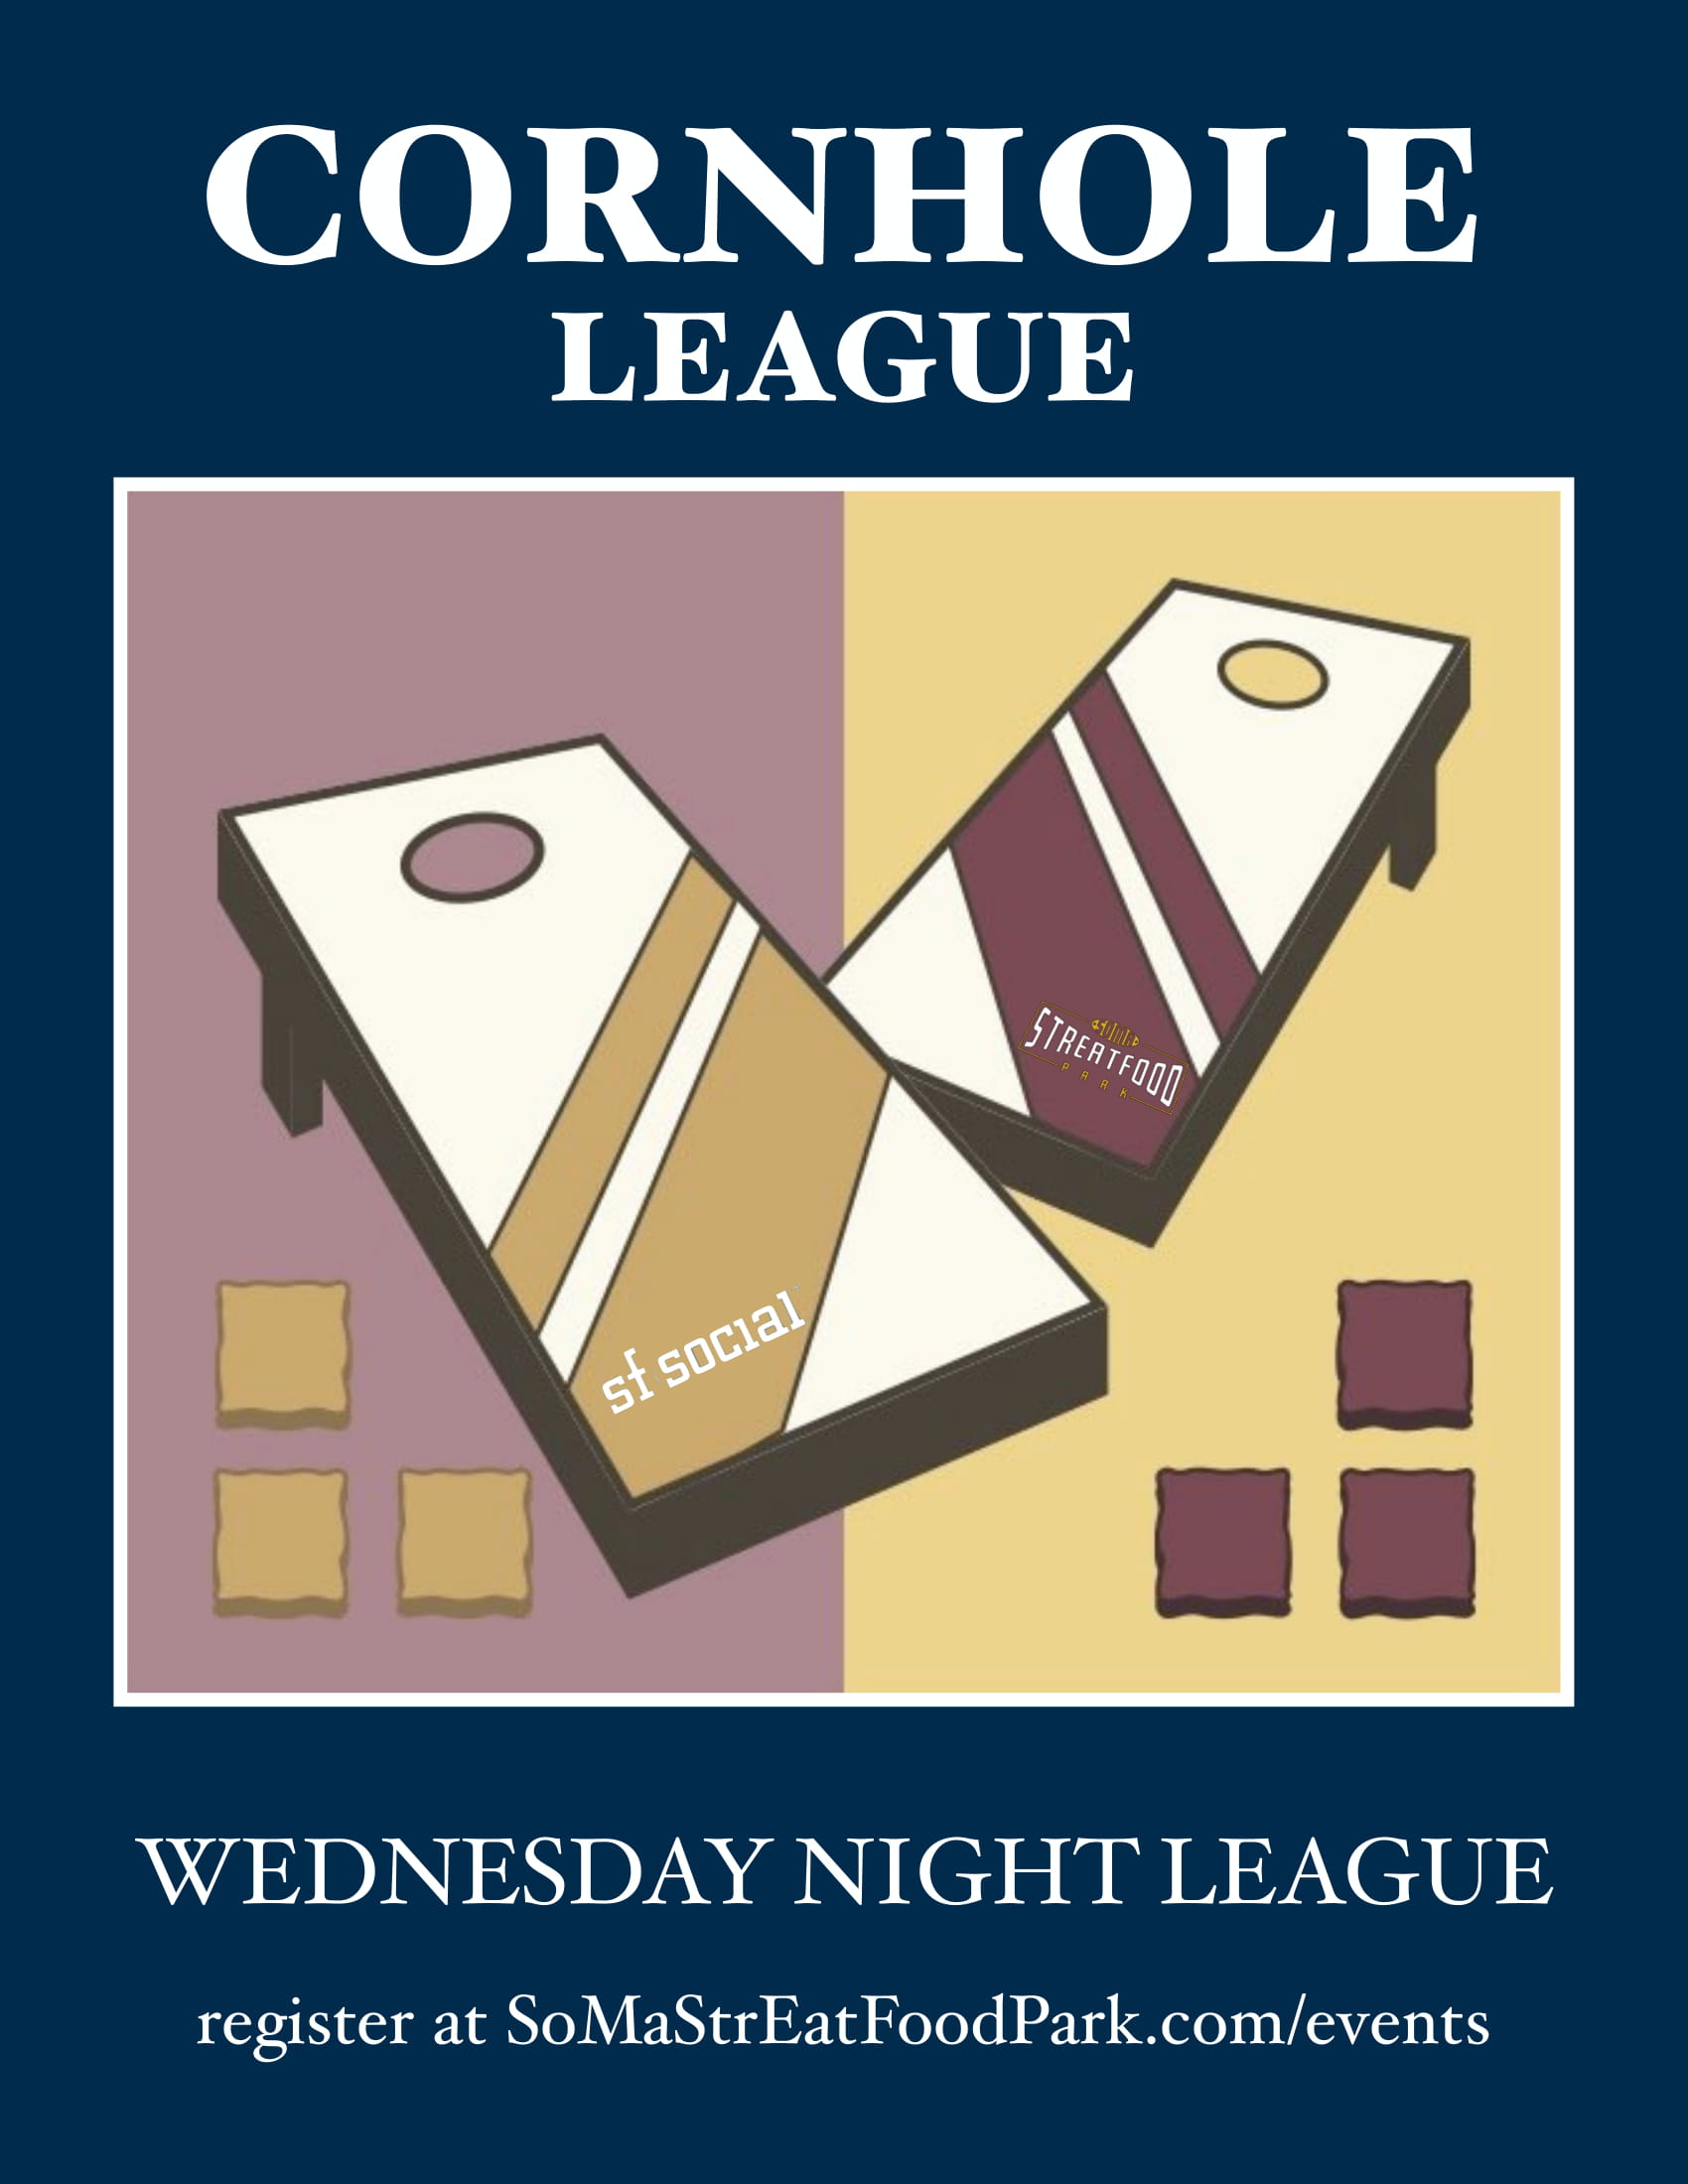 cornhole league flyer-1.jpg